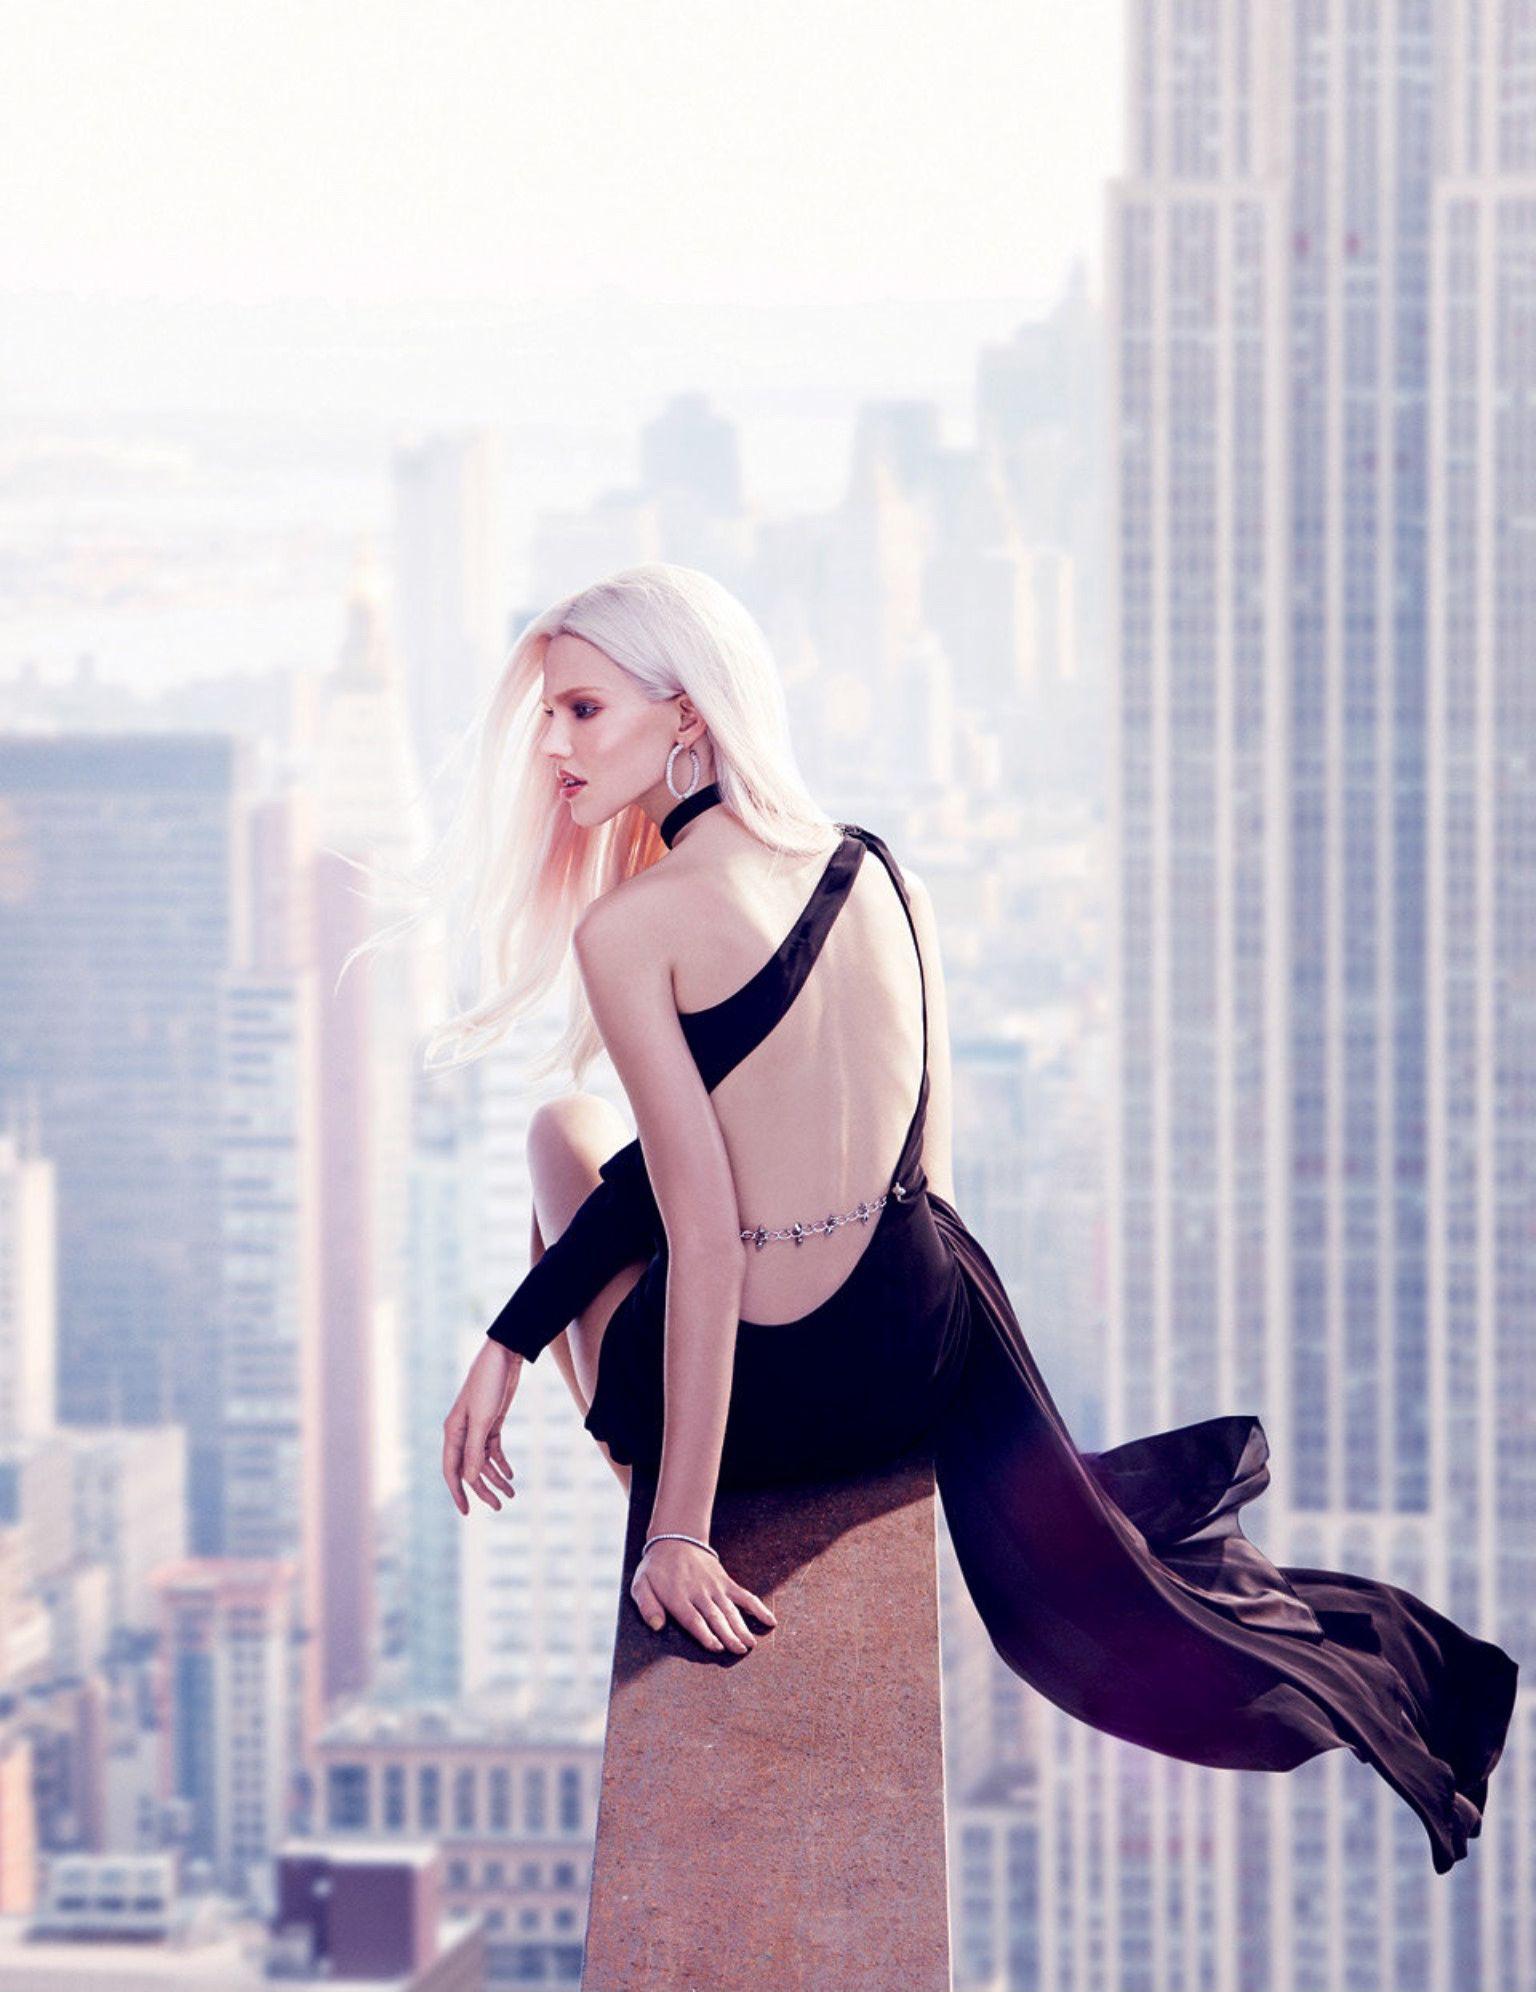 ☆ Sasha Luss | Photography by Alexi Lubomirski | For Vogue Magazine Russia | December 2015 ☆ #Sasha_Luss #Alexi_Lubomirski #Vogue #2015